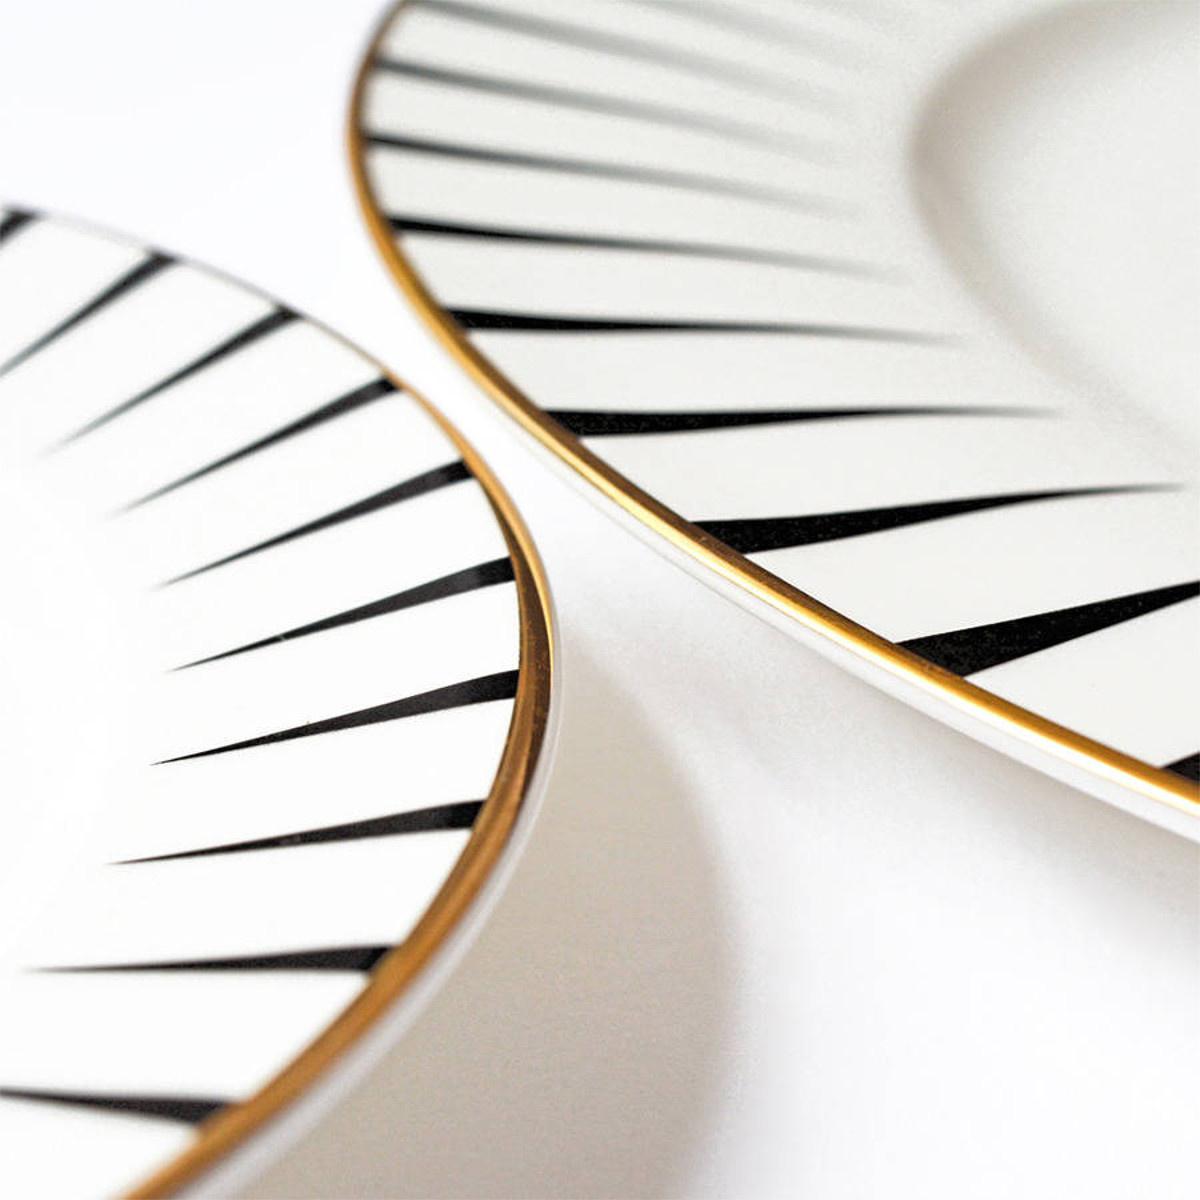 Yvonne Ellen London Monochrome Set of1 Dinner Plate Ø 26,5 cm and 1 Side Plate Ø 16 cm - Whale - Bone China - In Beautiful Giftbox